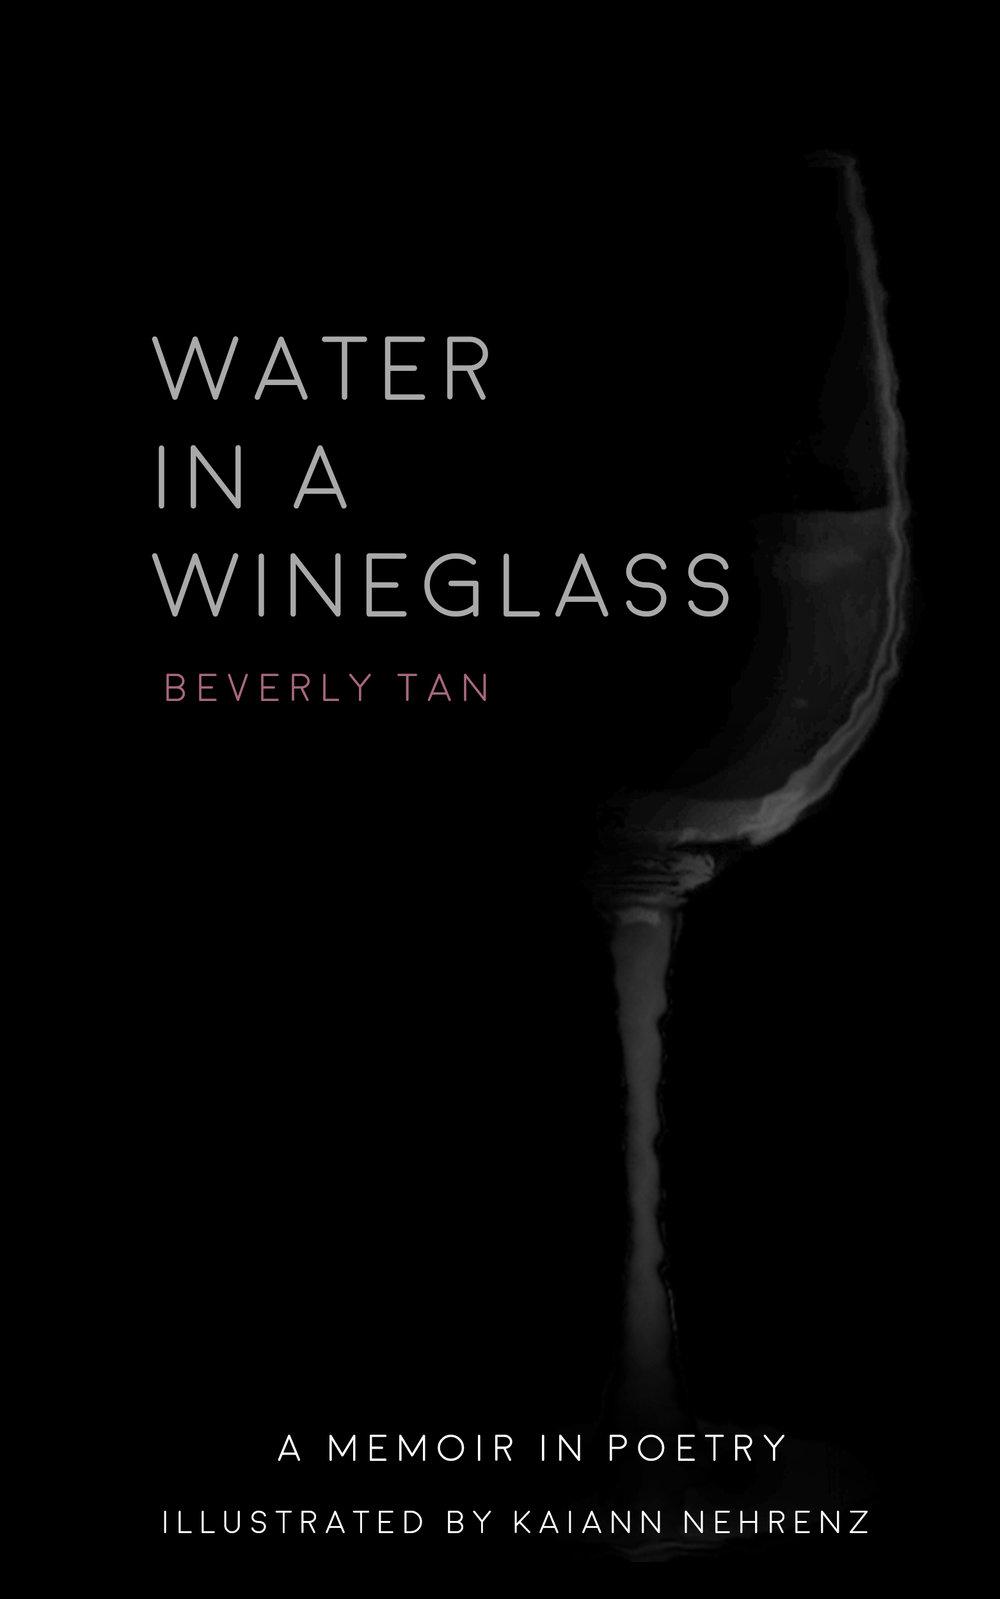 WaterInAWineglass2.jpg